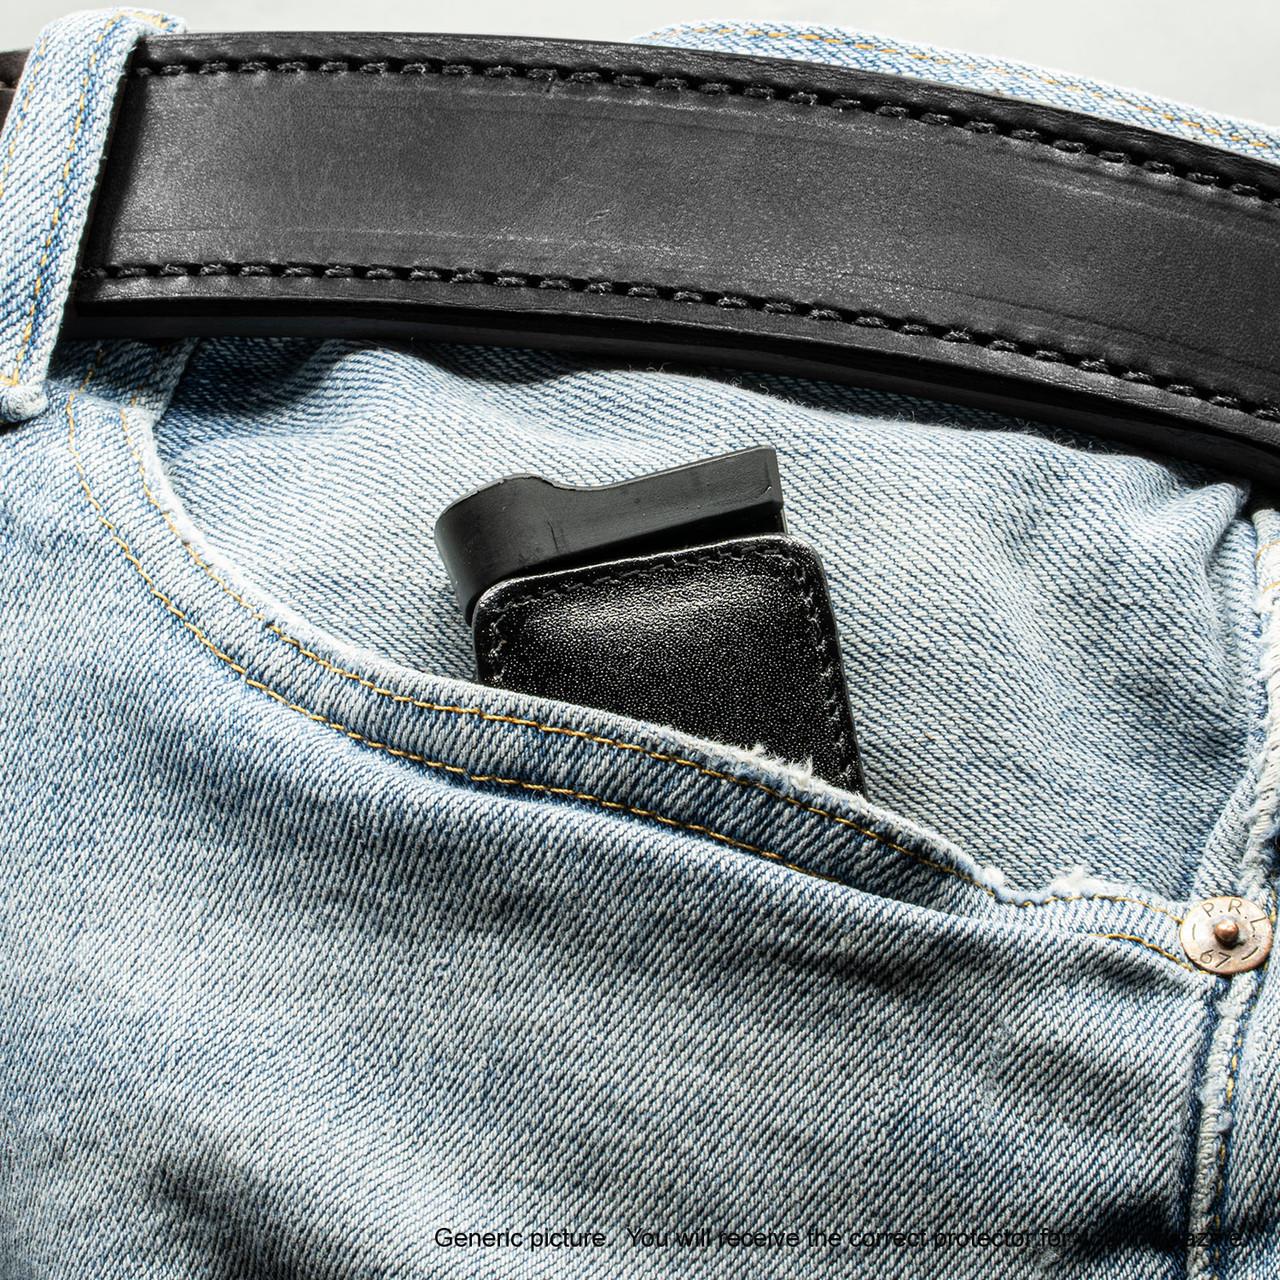 Glock 23 Black Leather Magazine Pocket Protector